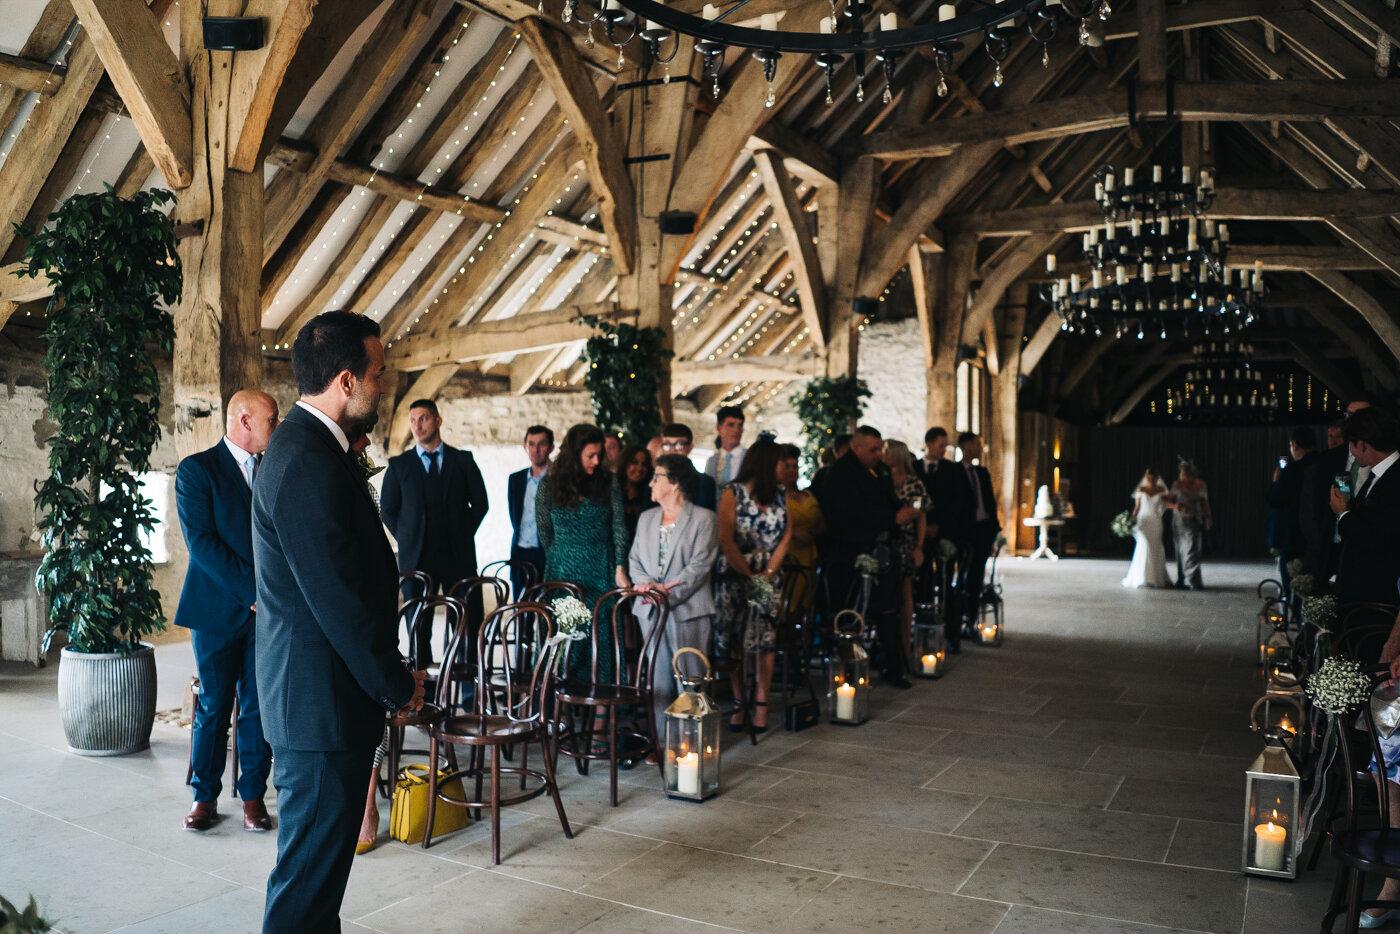 tithe-barn-bolton-abbey-north-yorkshire-cripps-wedding-photographer-creative-0019.jpg